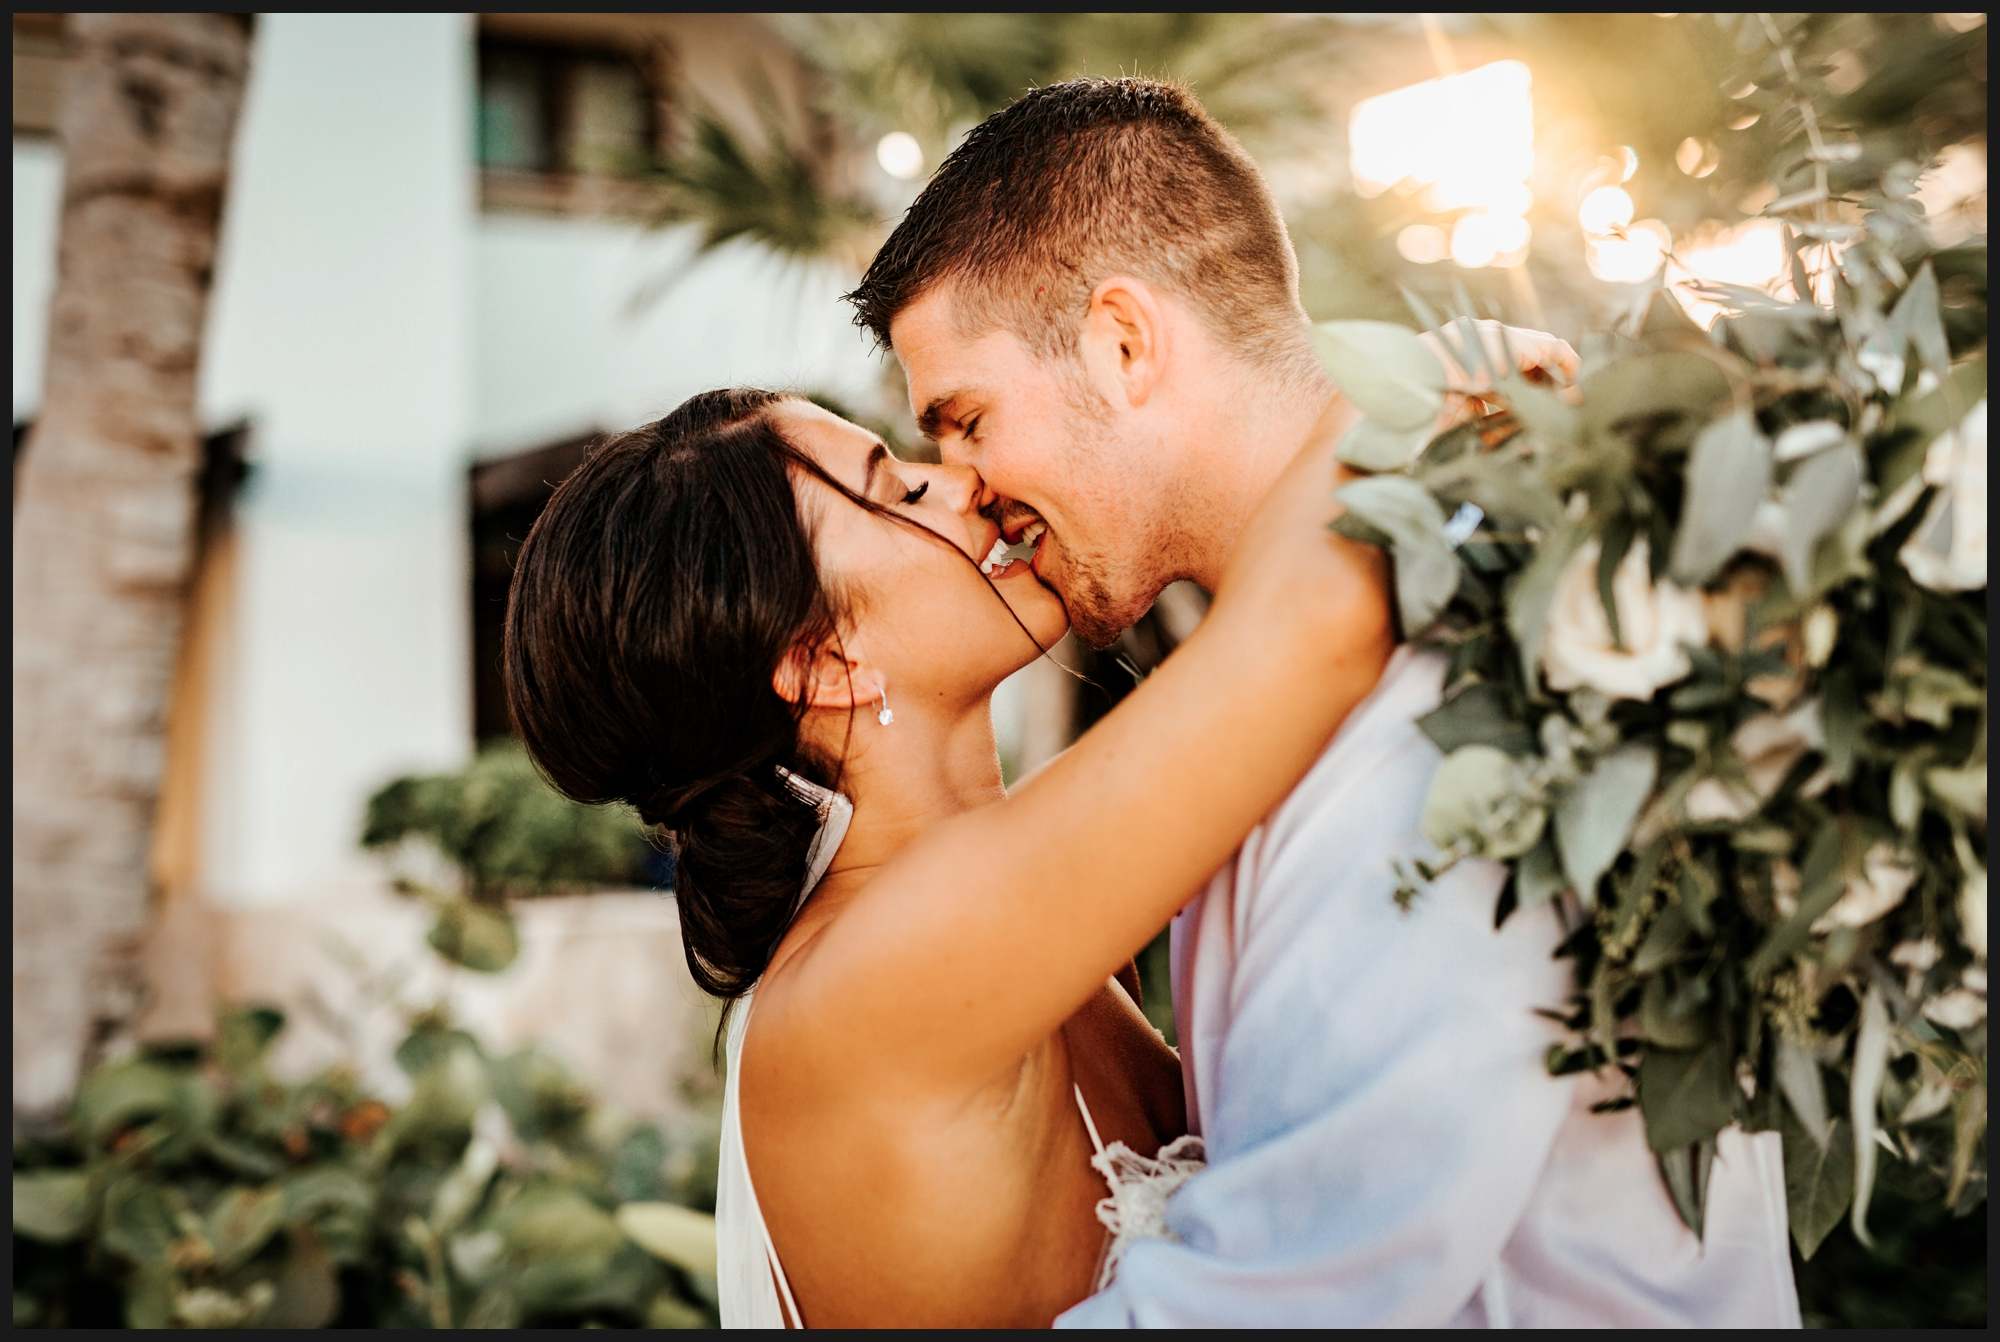 Orlando-Wedding-Photographer-destination-wedding-photographer-florida-wedding-photographer-bohemian-wedding-photographer_0519.jpg